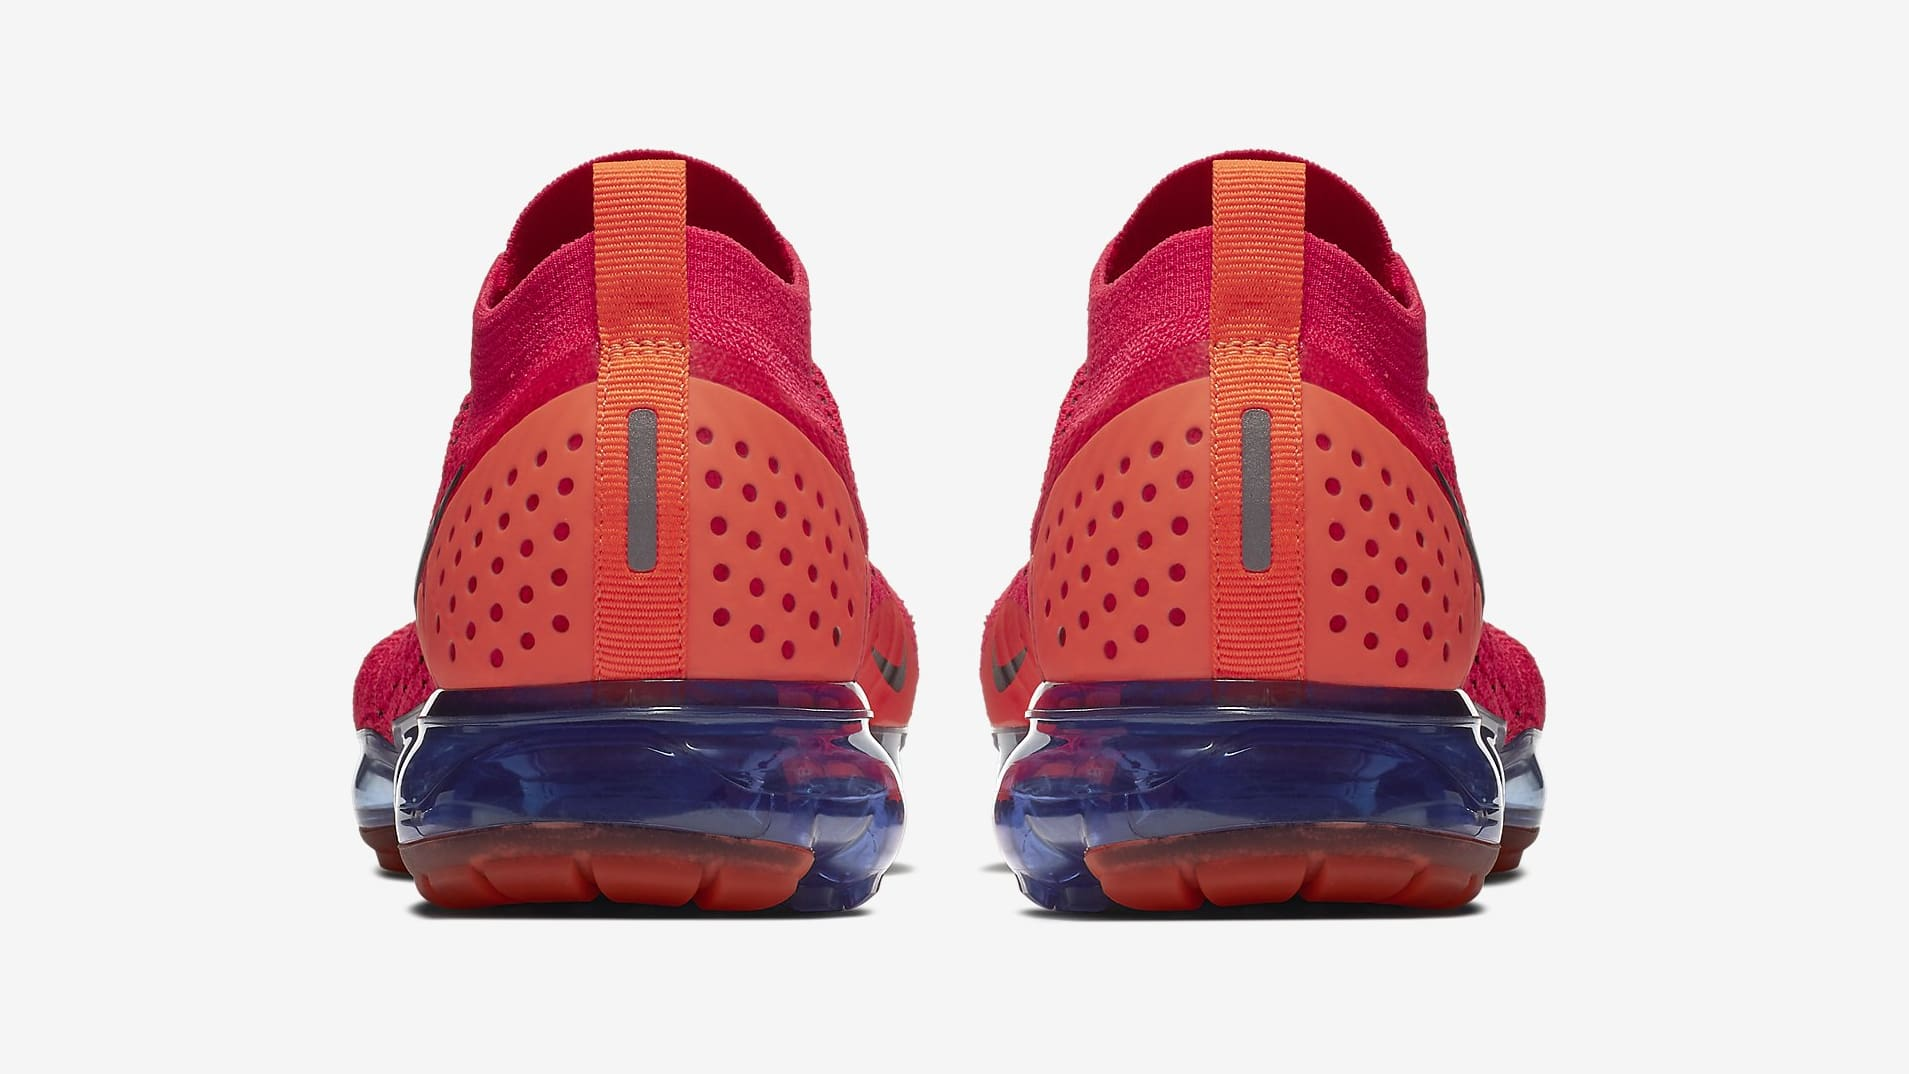 a765753e811 Nike Air Vapormax Flyknit 2